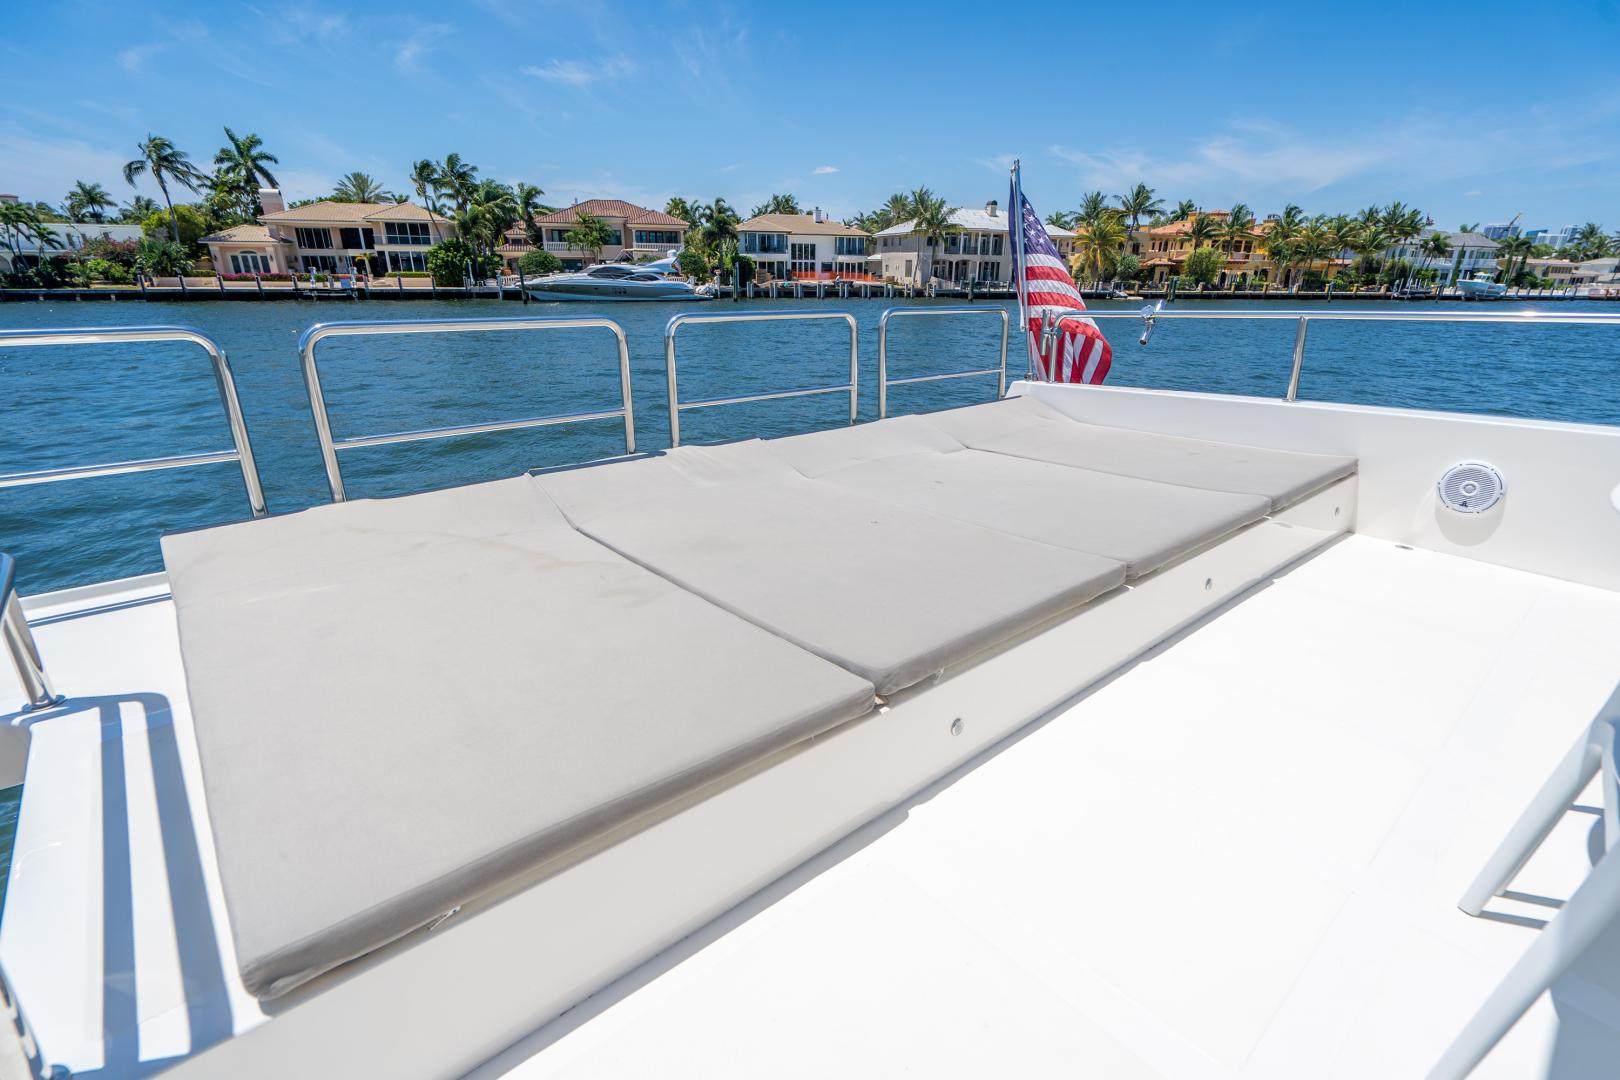 Overblue-58 Power Catamaran 2017-Techuila Ft. Lauderdale-Florida-United States-2017 Overblue 58 Powercat-1401186   Thumbnail